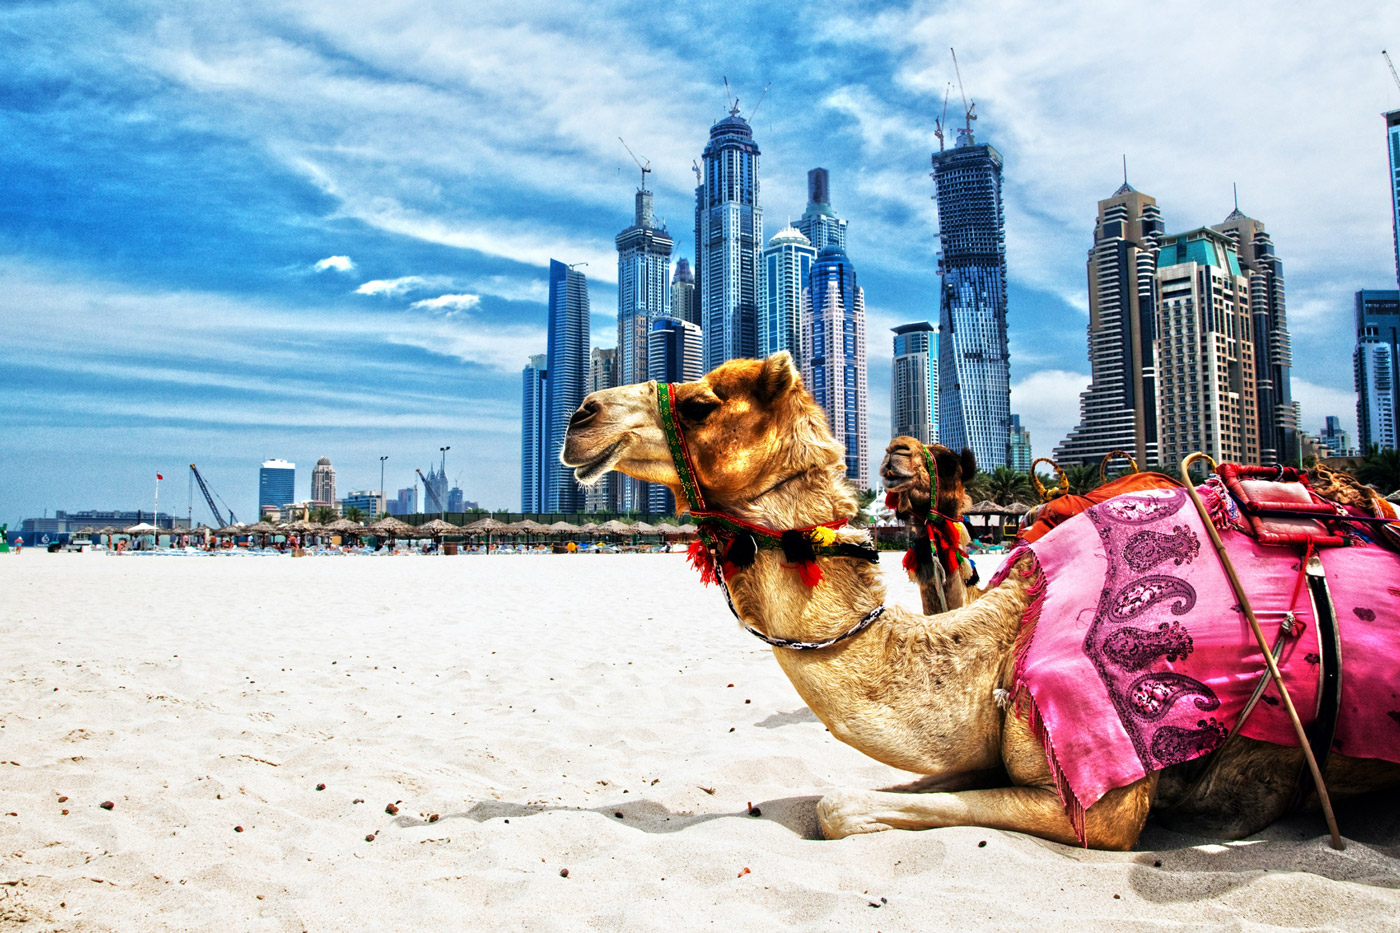 Тур с круизом на Costa Diadema 5*  по Персидскому заливу - Туристический оператор APL Travel (АПЛ Тревел)